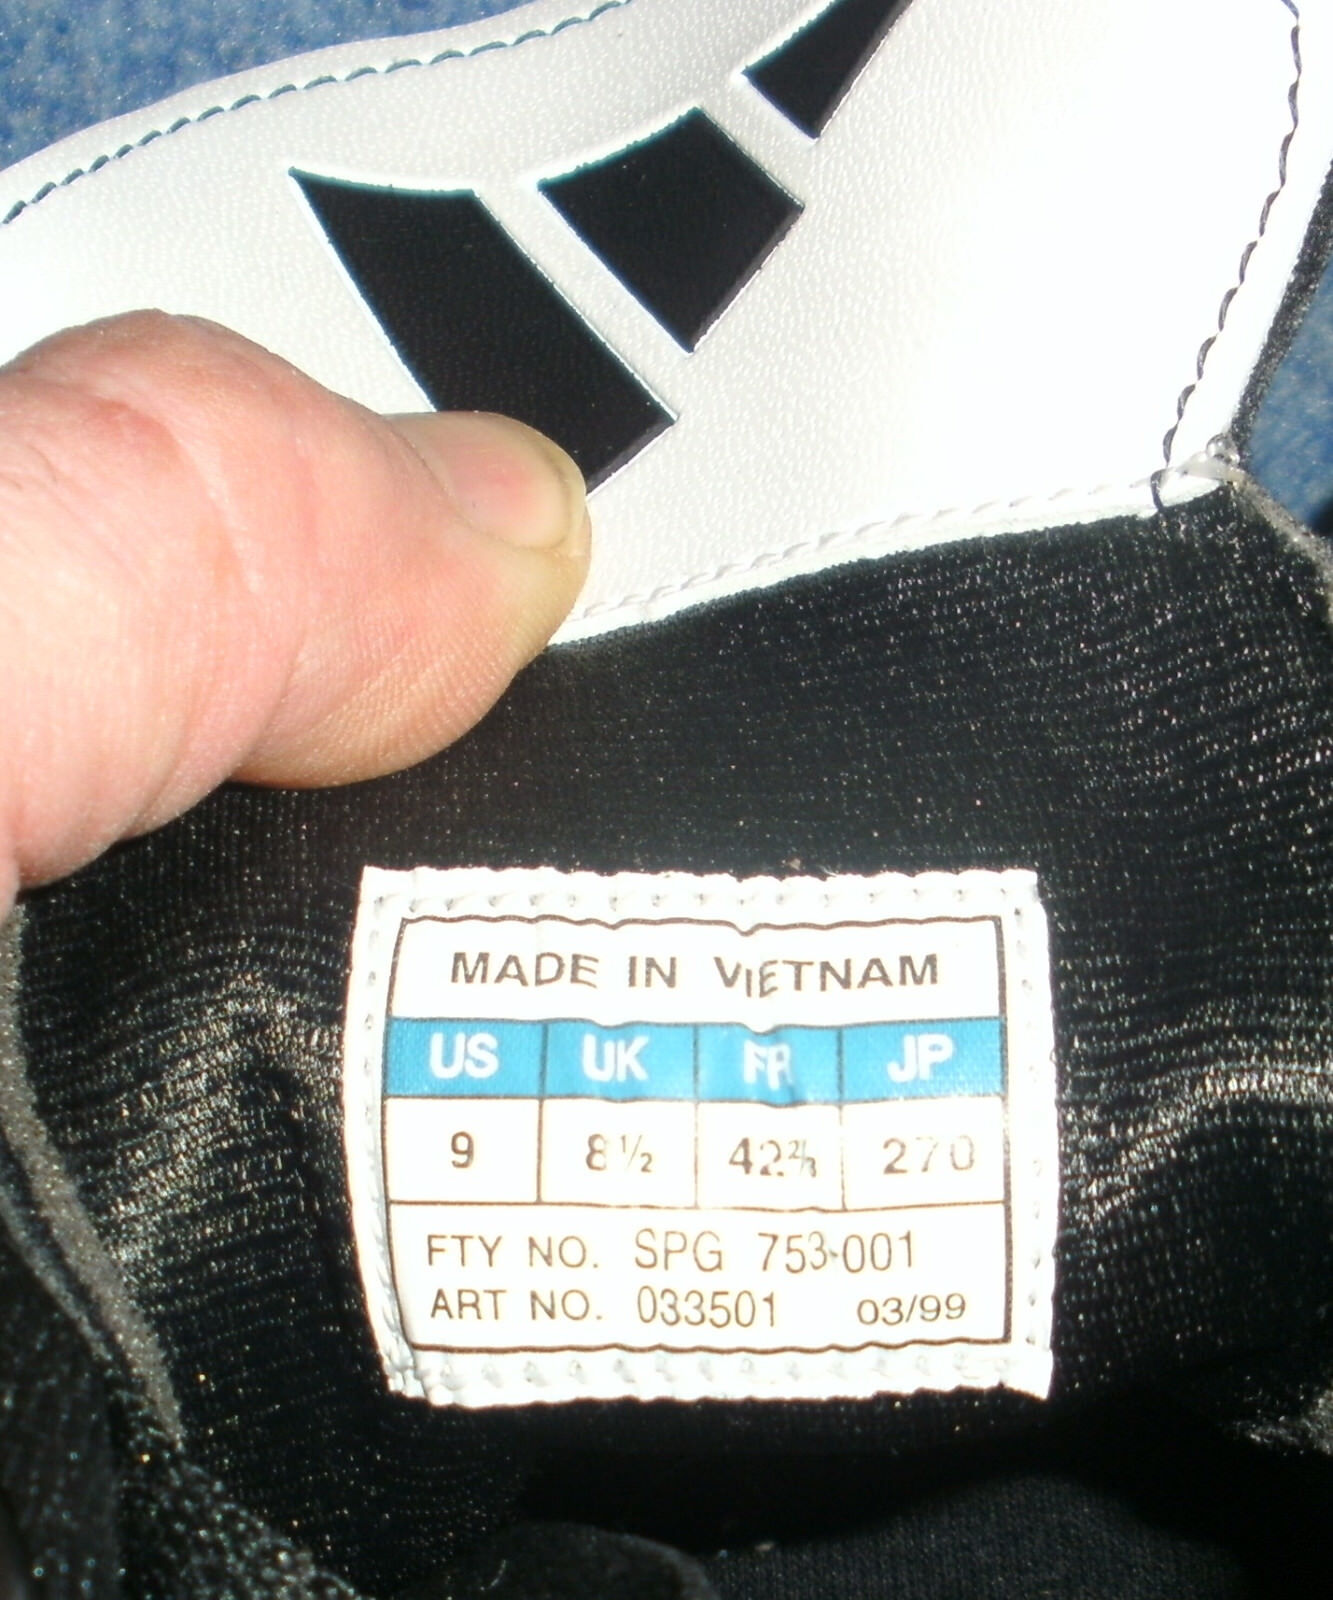 Neue Vintage Adidas Fußballschuhe Soccer Soccer Soccer Tektral Cup Equipment SG, Gr. 42 2 3 0558a6